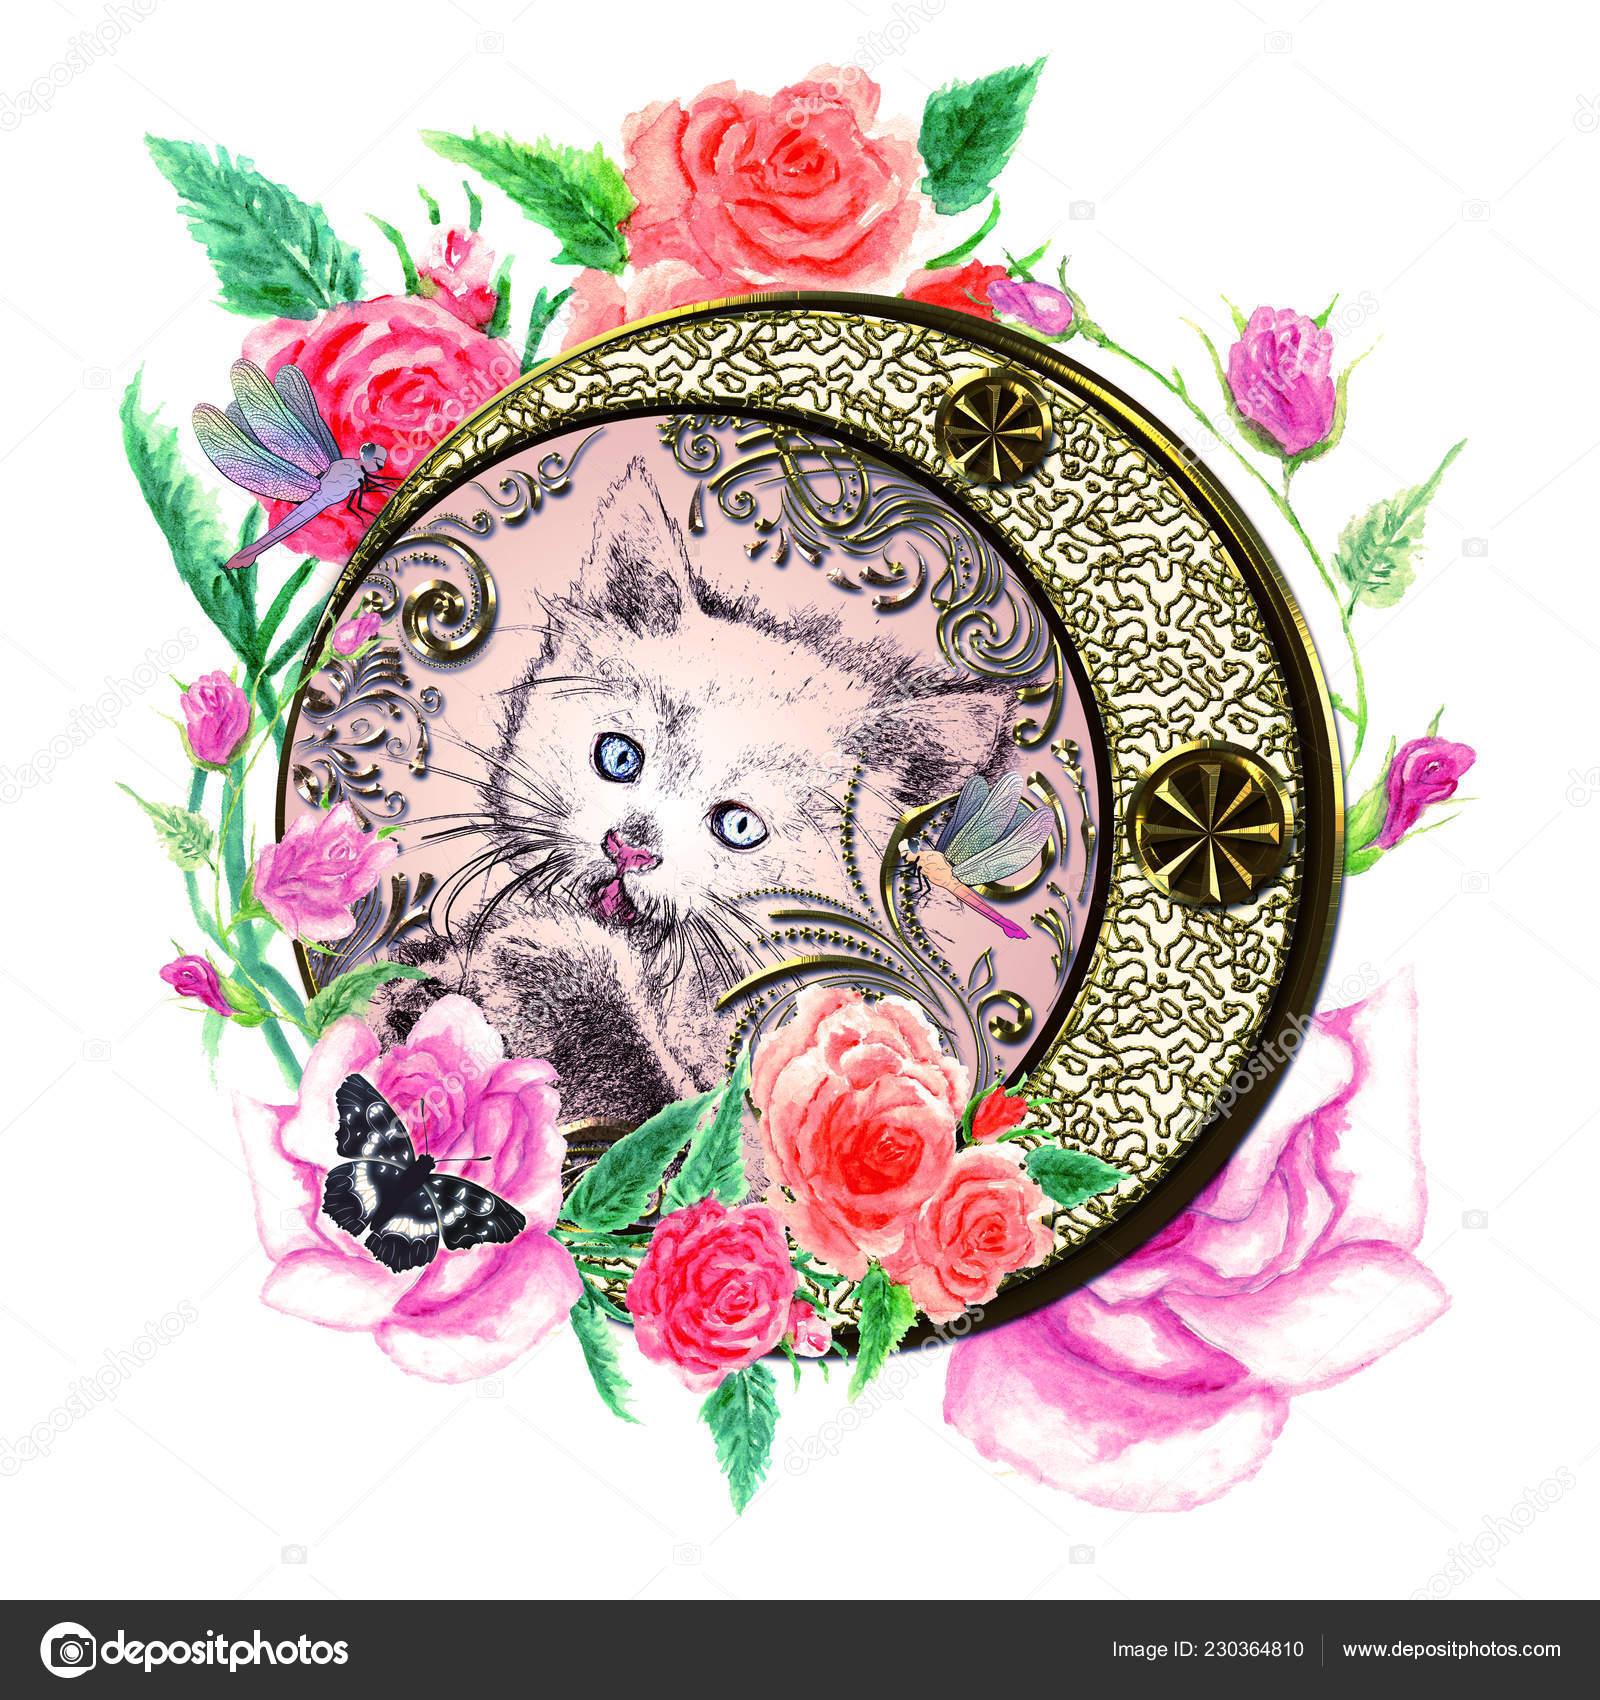 zdobené obrázky kočička